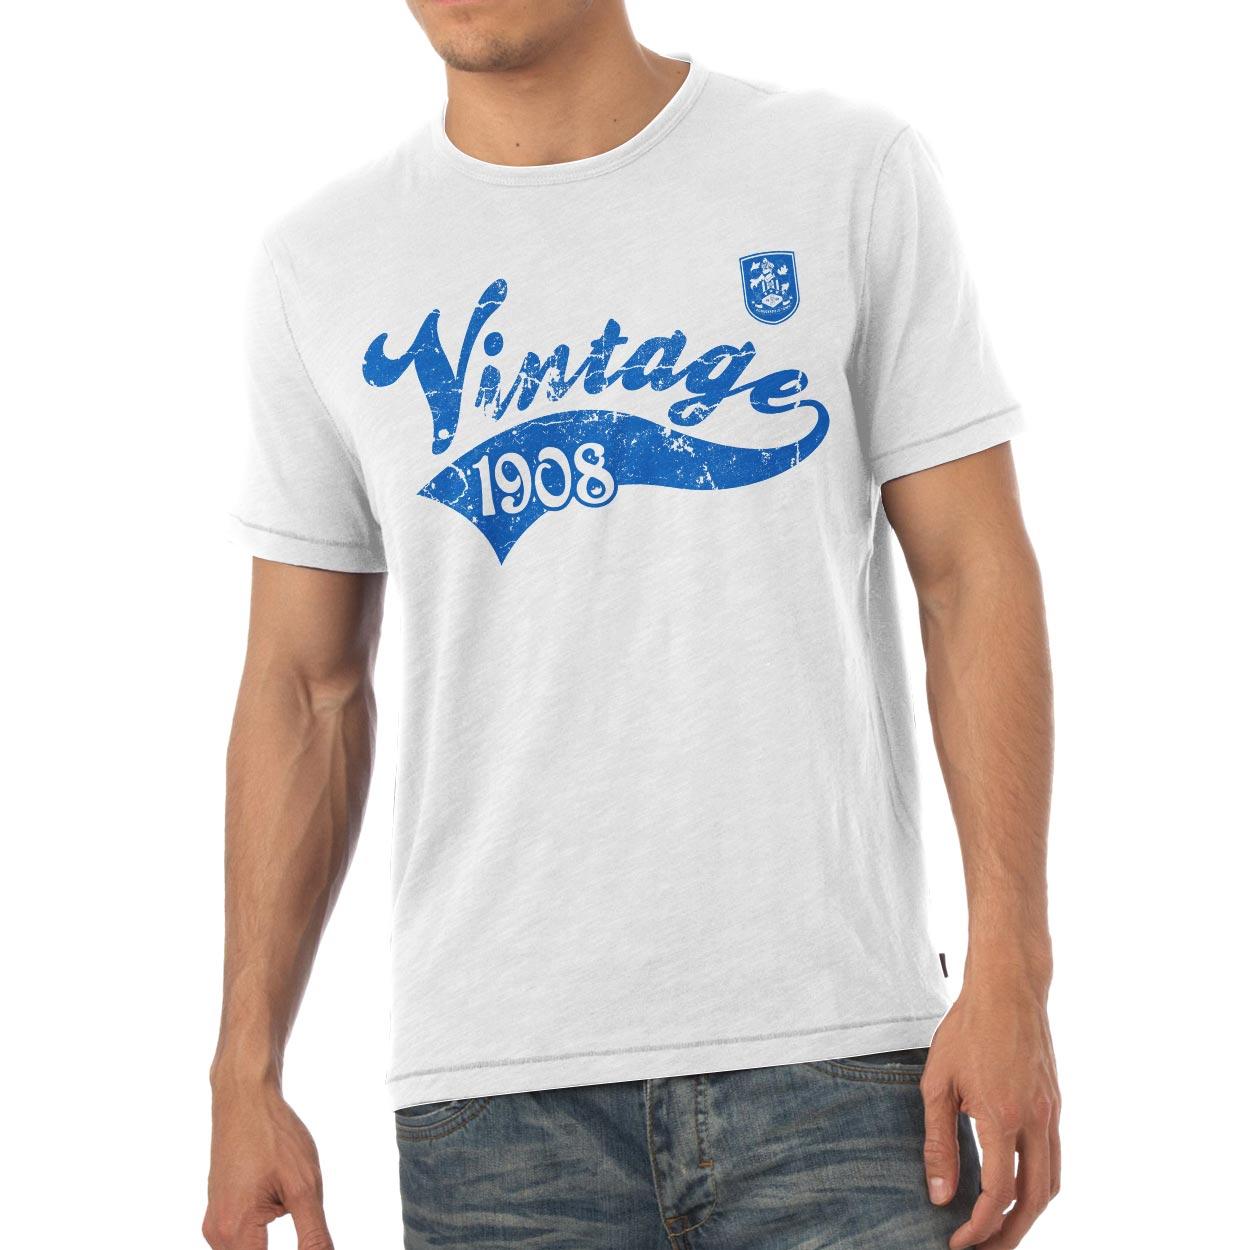 Huddersfield Town Mens Vintage T-Shirt